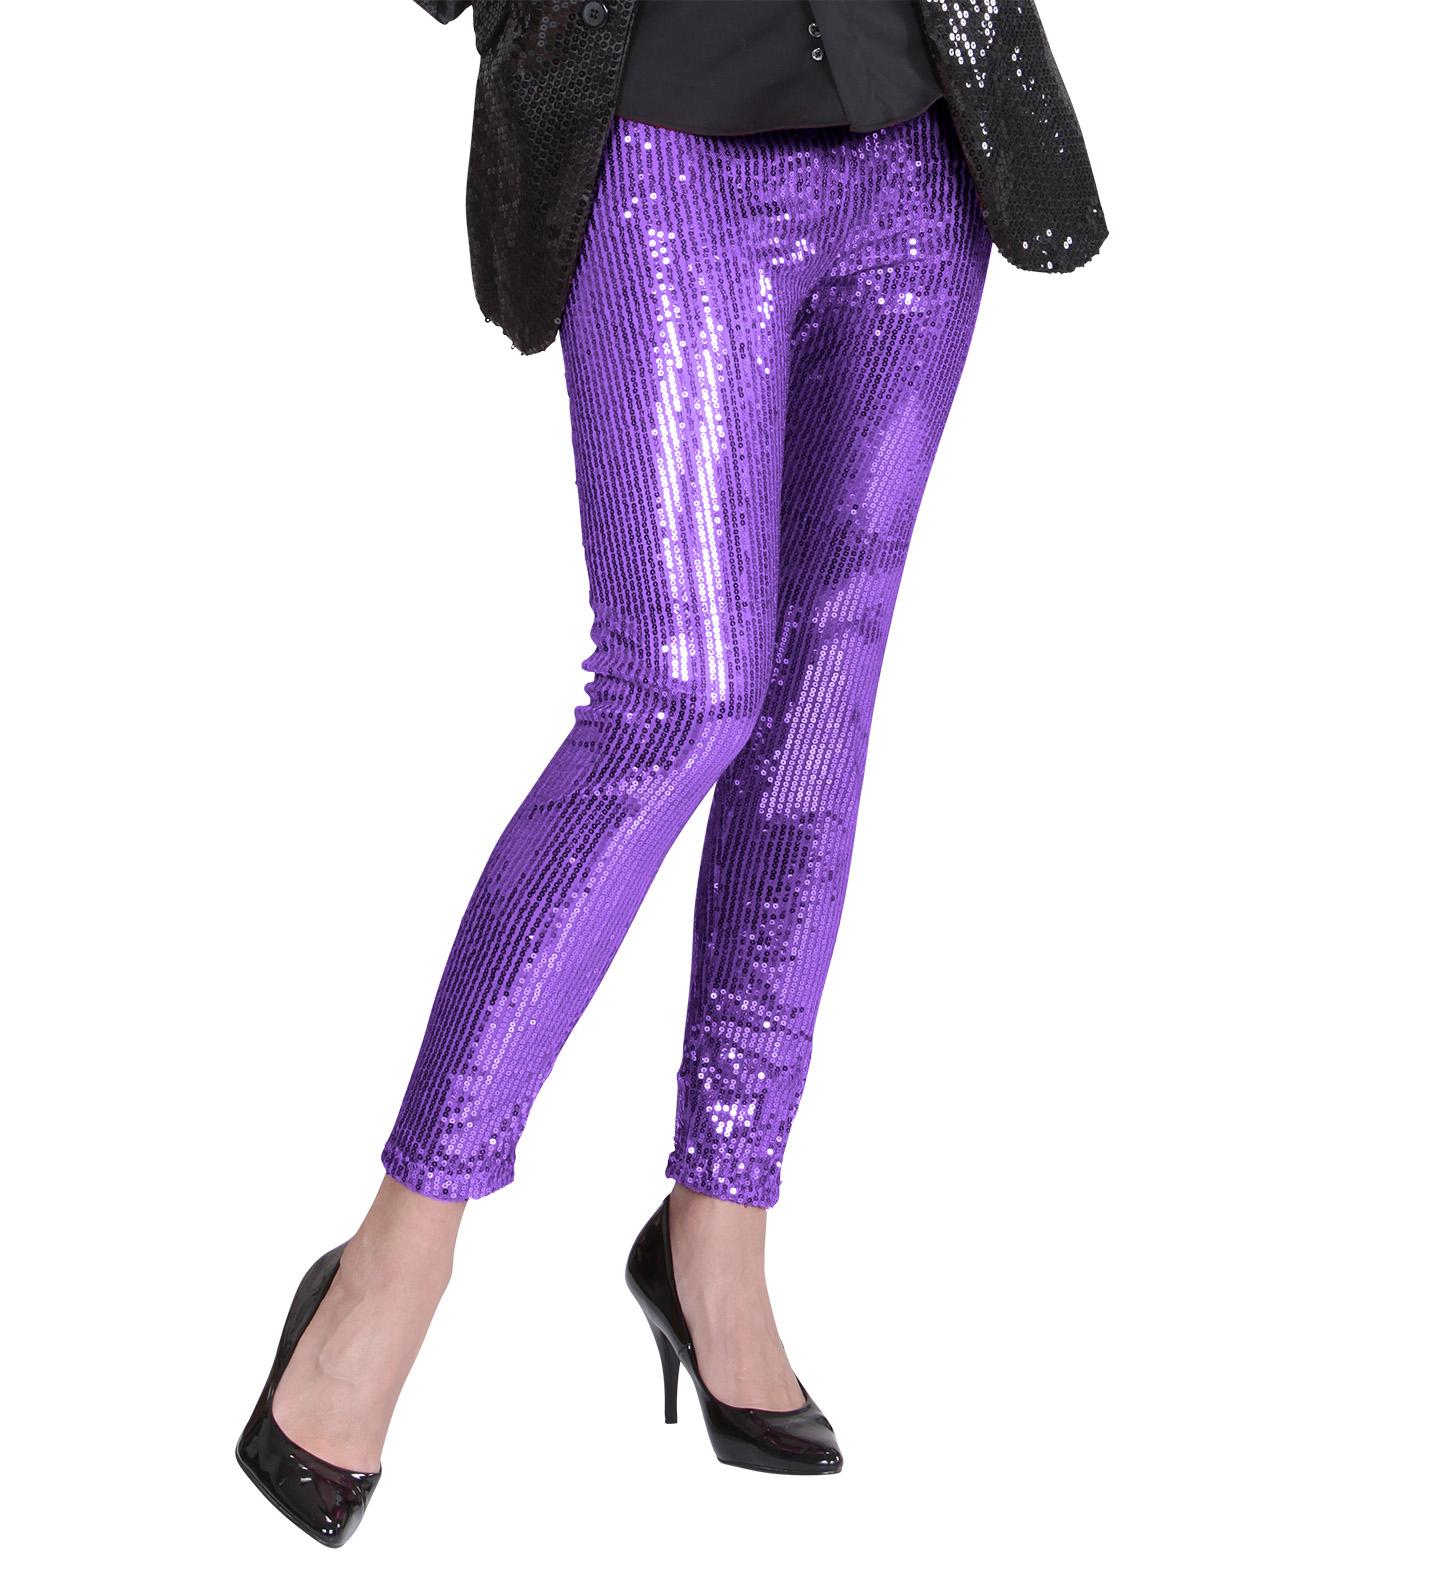 Purple Sequin Leggings Stockings Tights Pantyhose Lingerie Fancy Dress